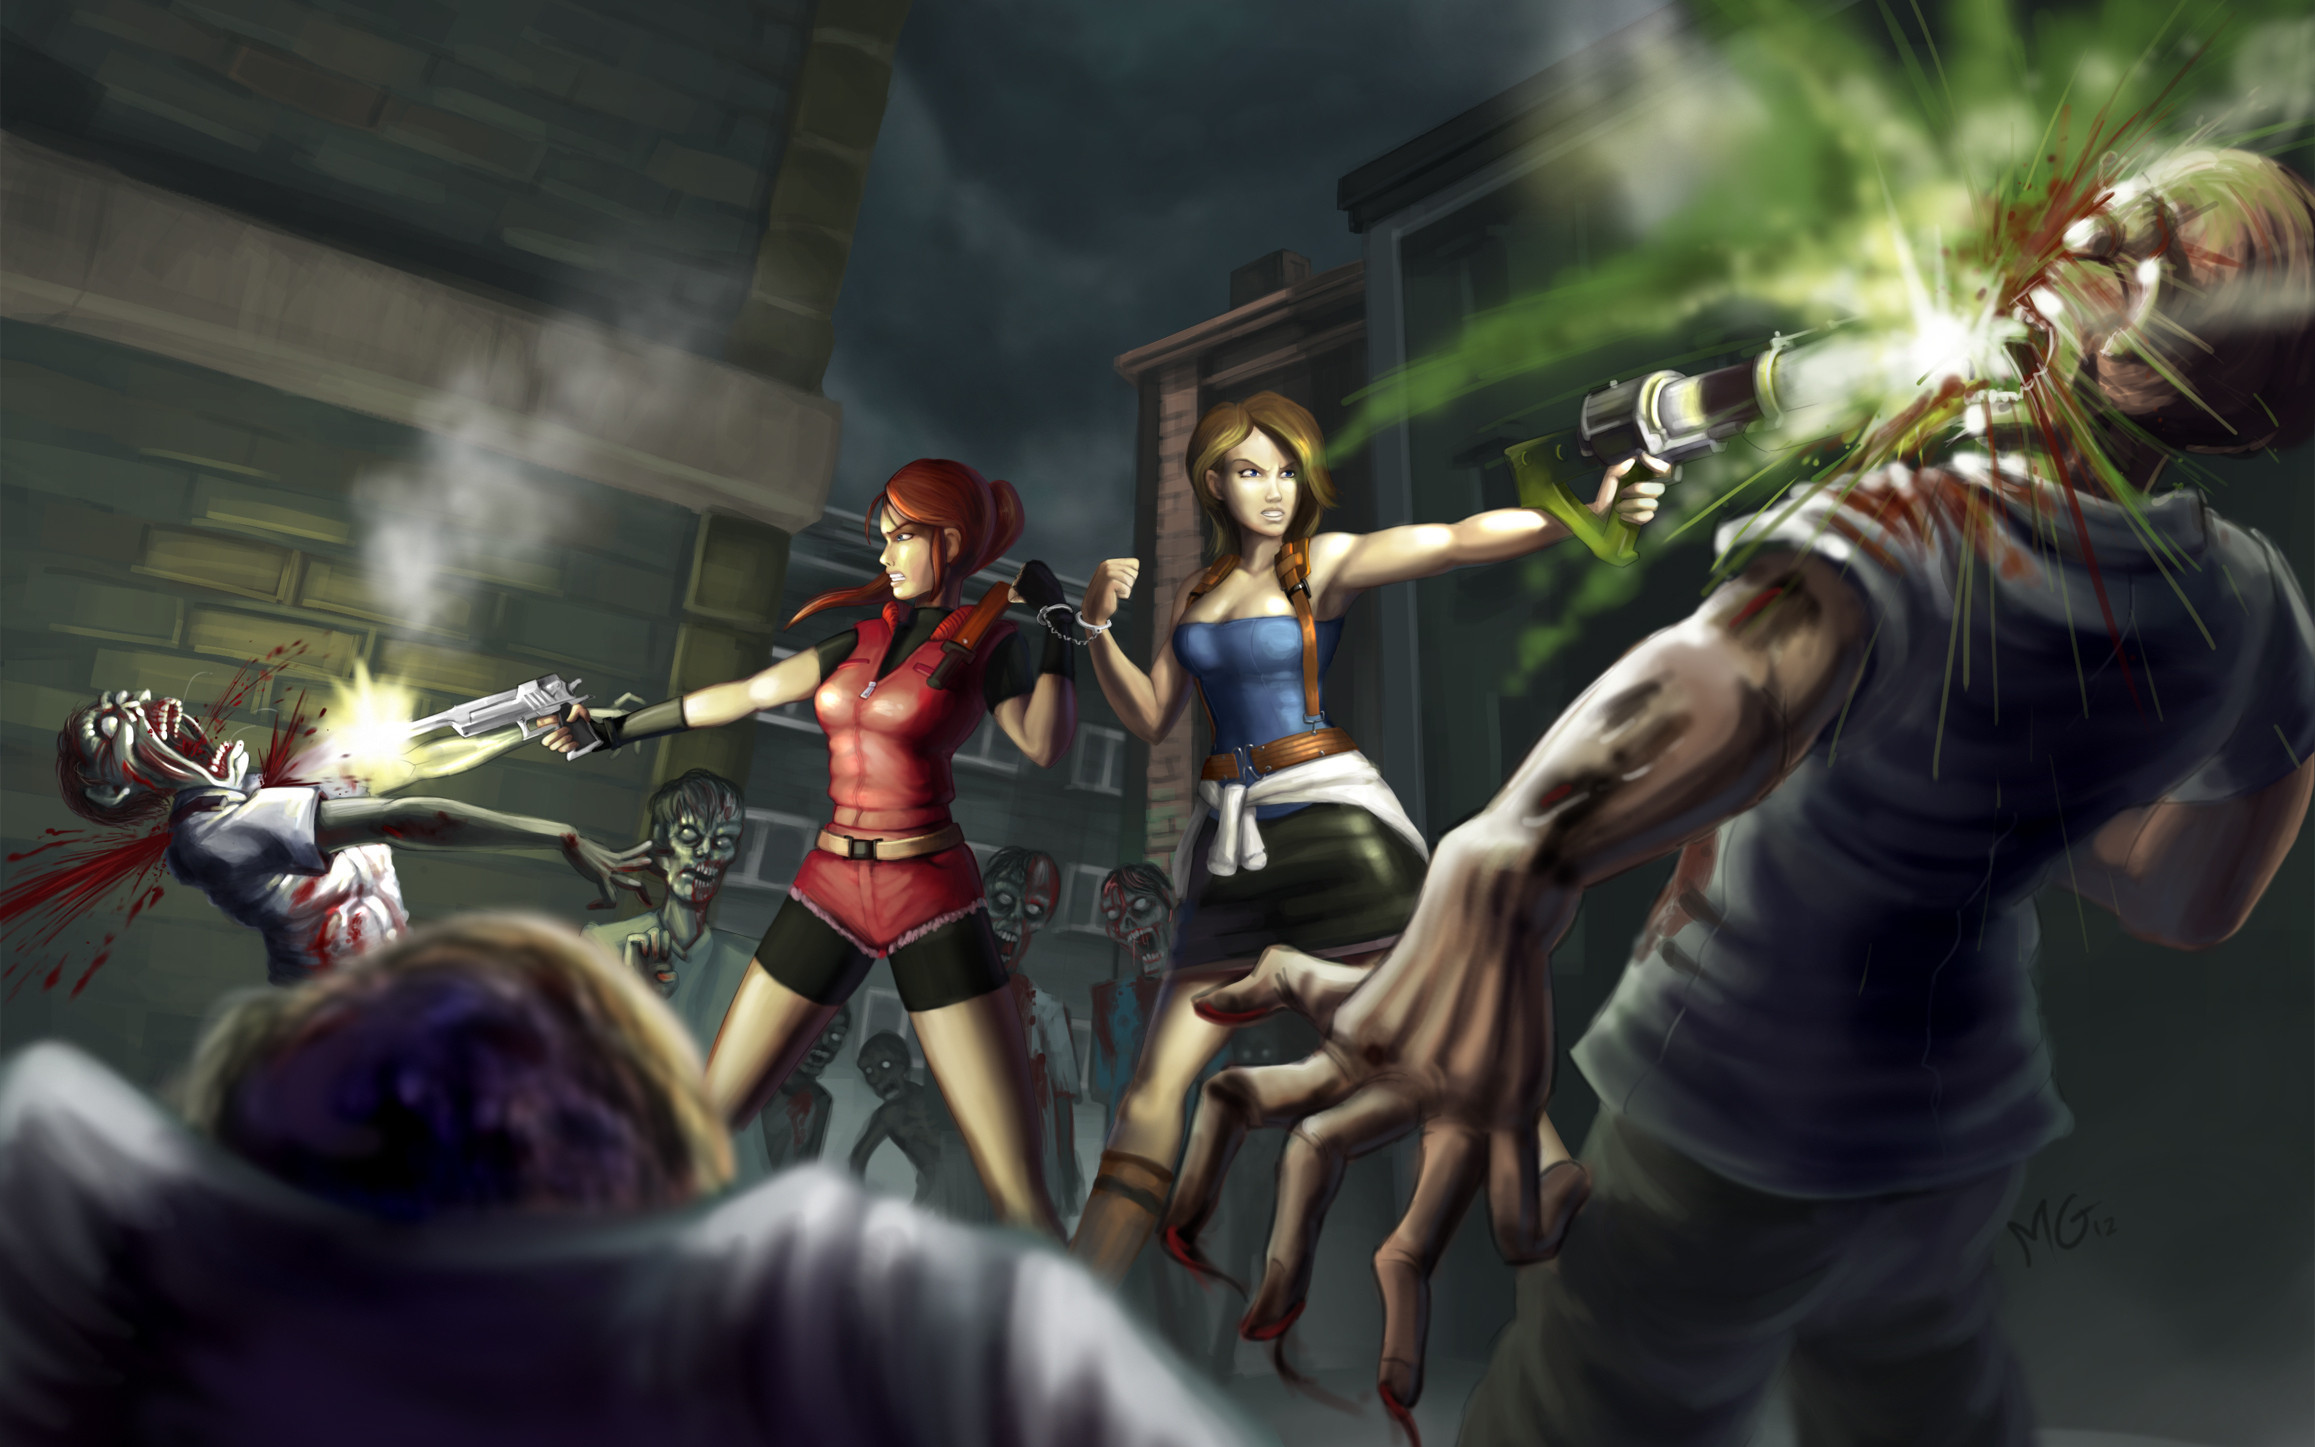 Res: 2315x1447, Resident Evil 6 Claire Redfield Jill Valentine blood zombie dark wallpaper  |  | 133490 | WallpaperUP